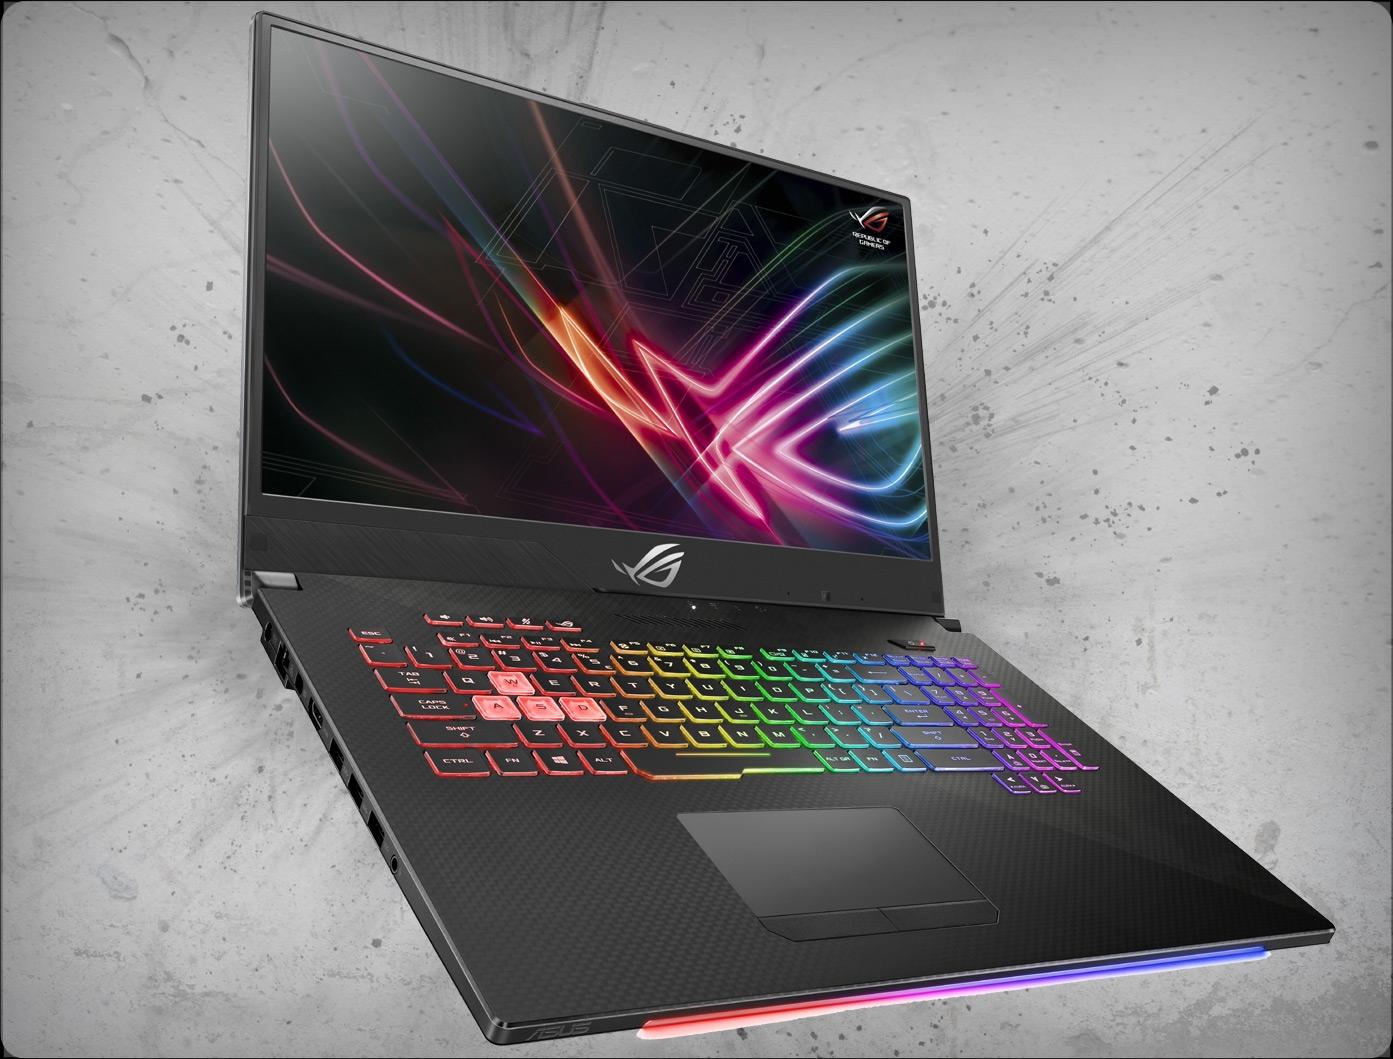 Asus ROG Strix Scar II GL704GM-DH74 144Hz nVidia GTX 1060 6GB, 8th Gen  Intel Core i7-8750H